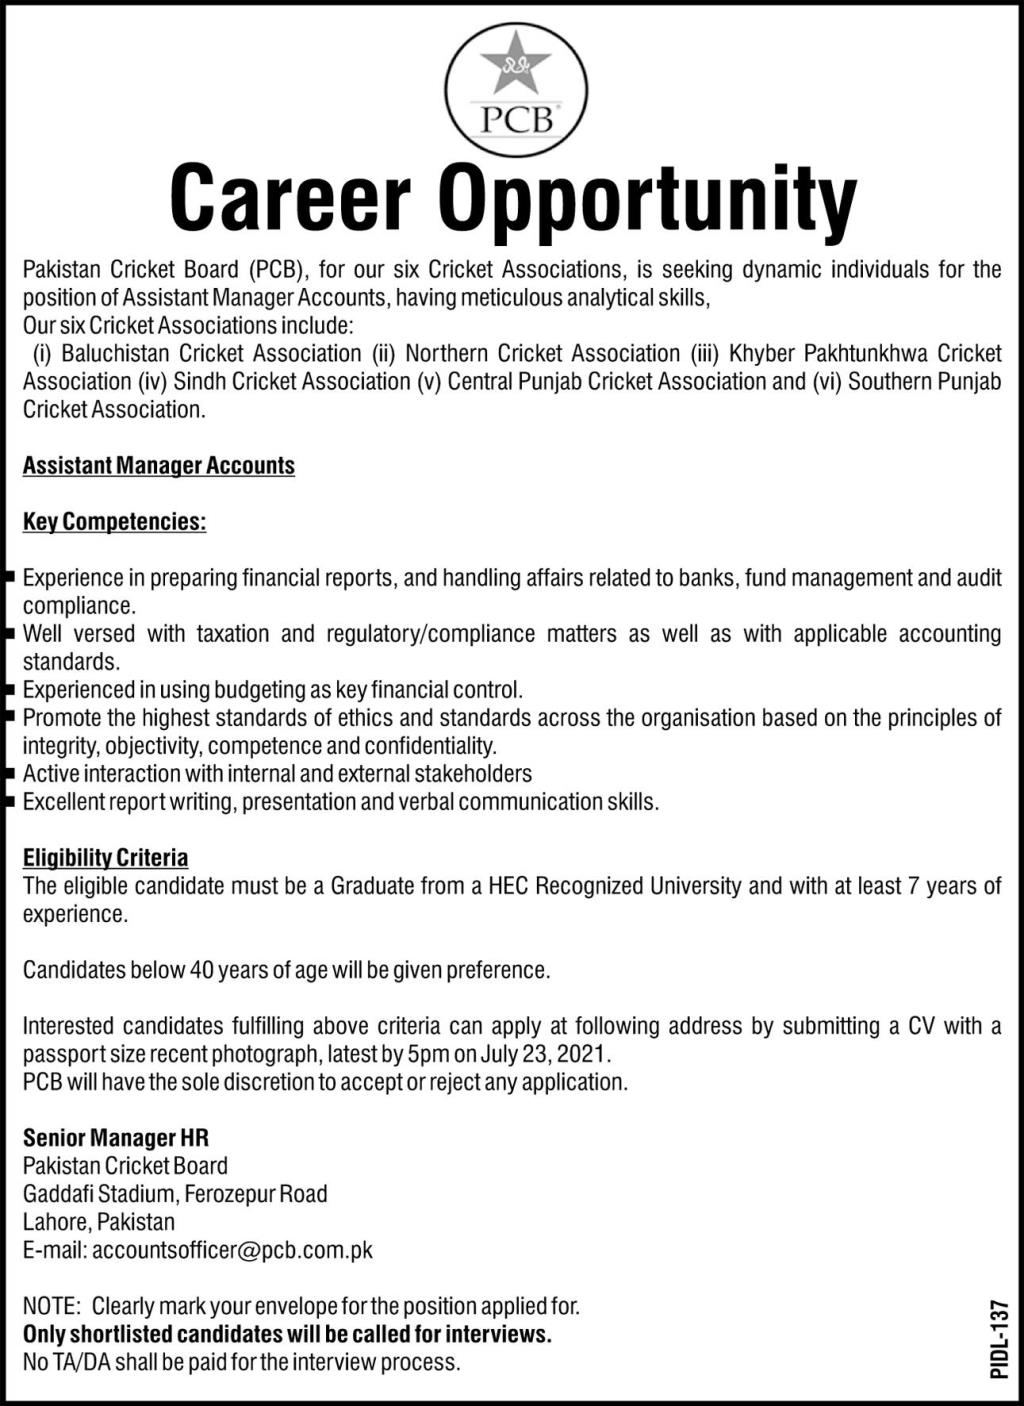 Pcb jobs